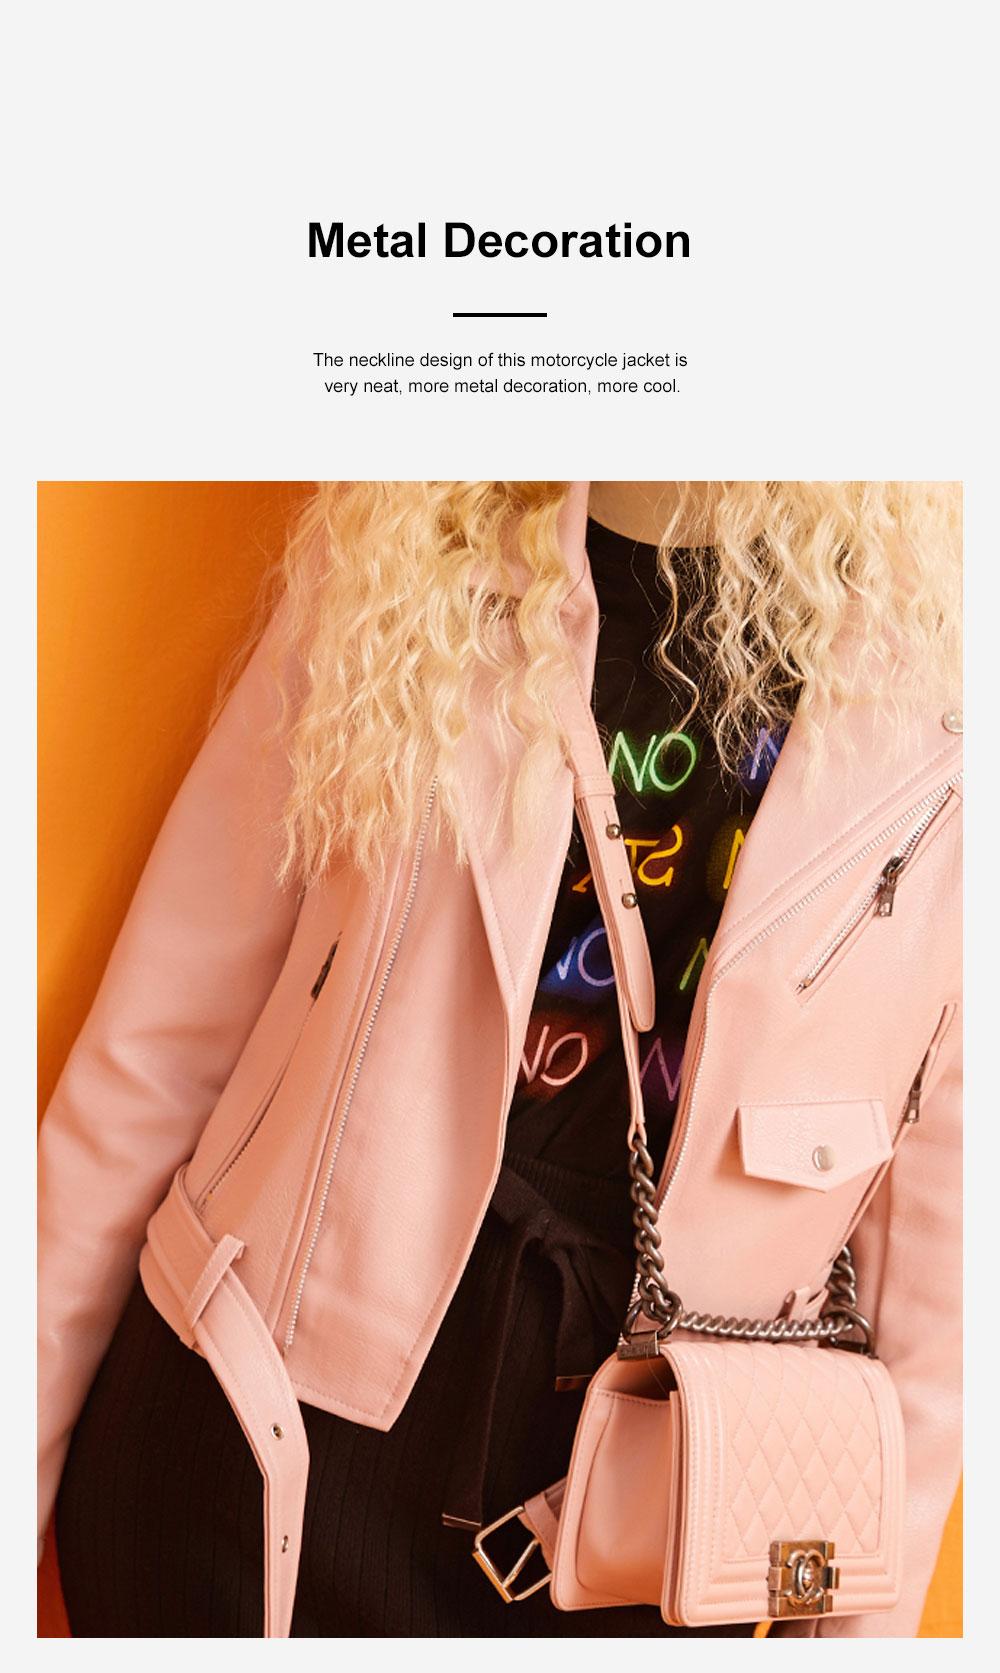 ELFSACK Short Locomotive Suit New Retro Loose Black PU Leather Top in Autumn 2019 Girls' Top Coat 5